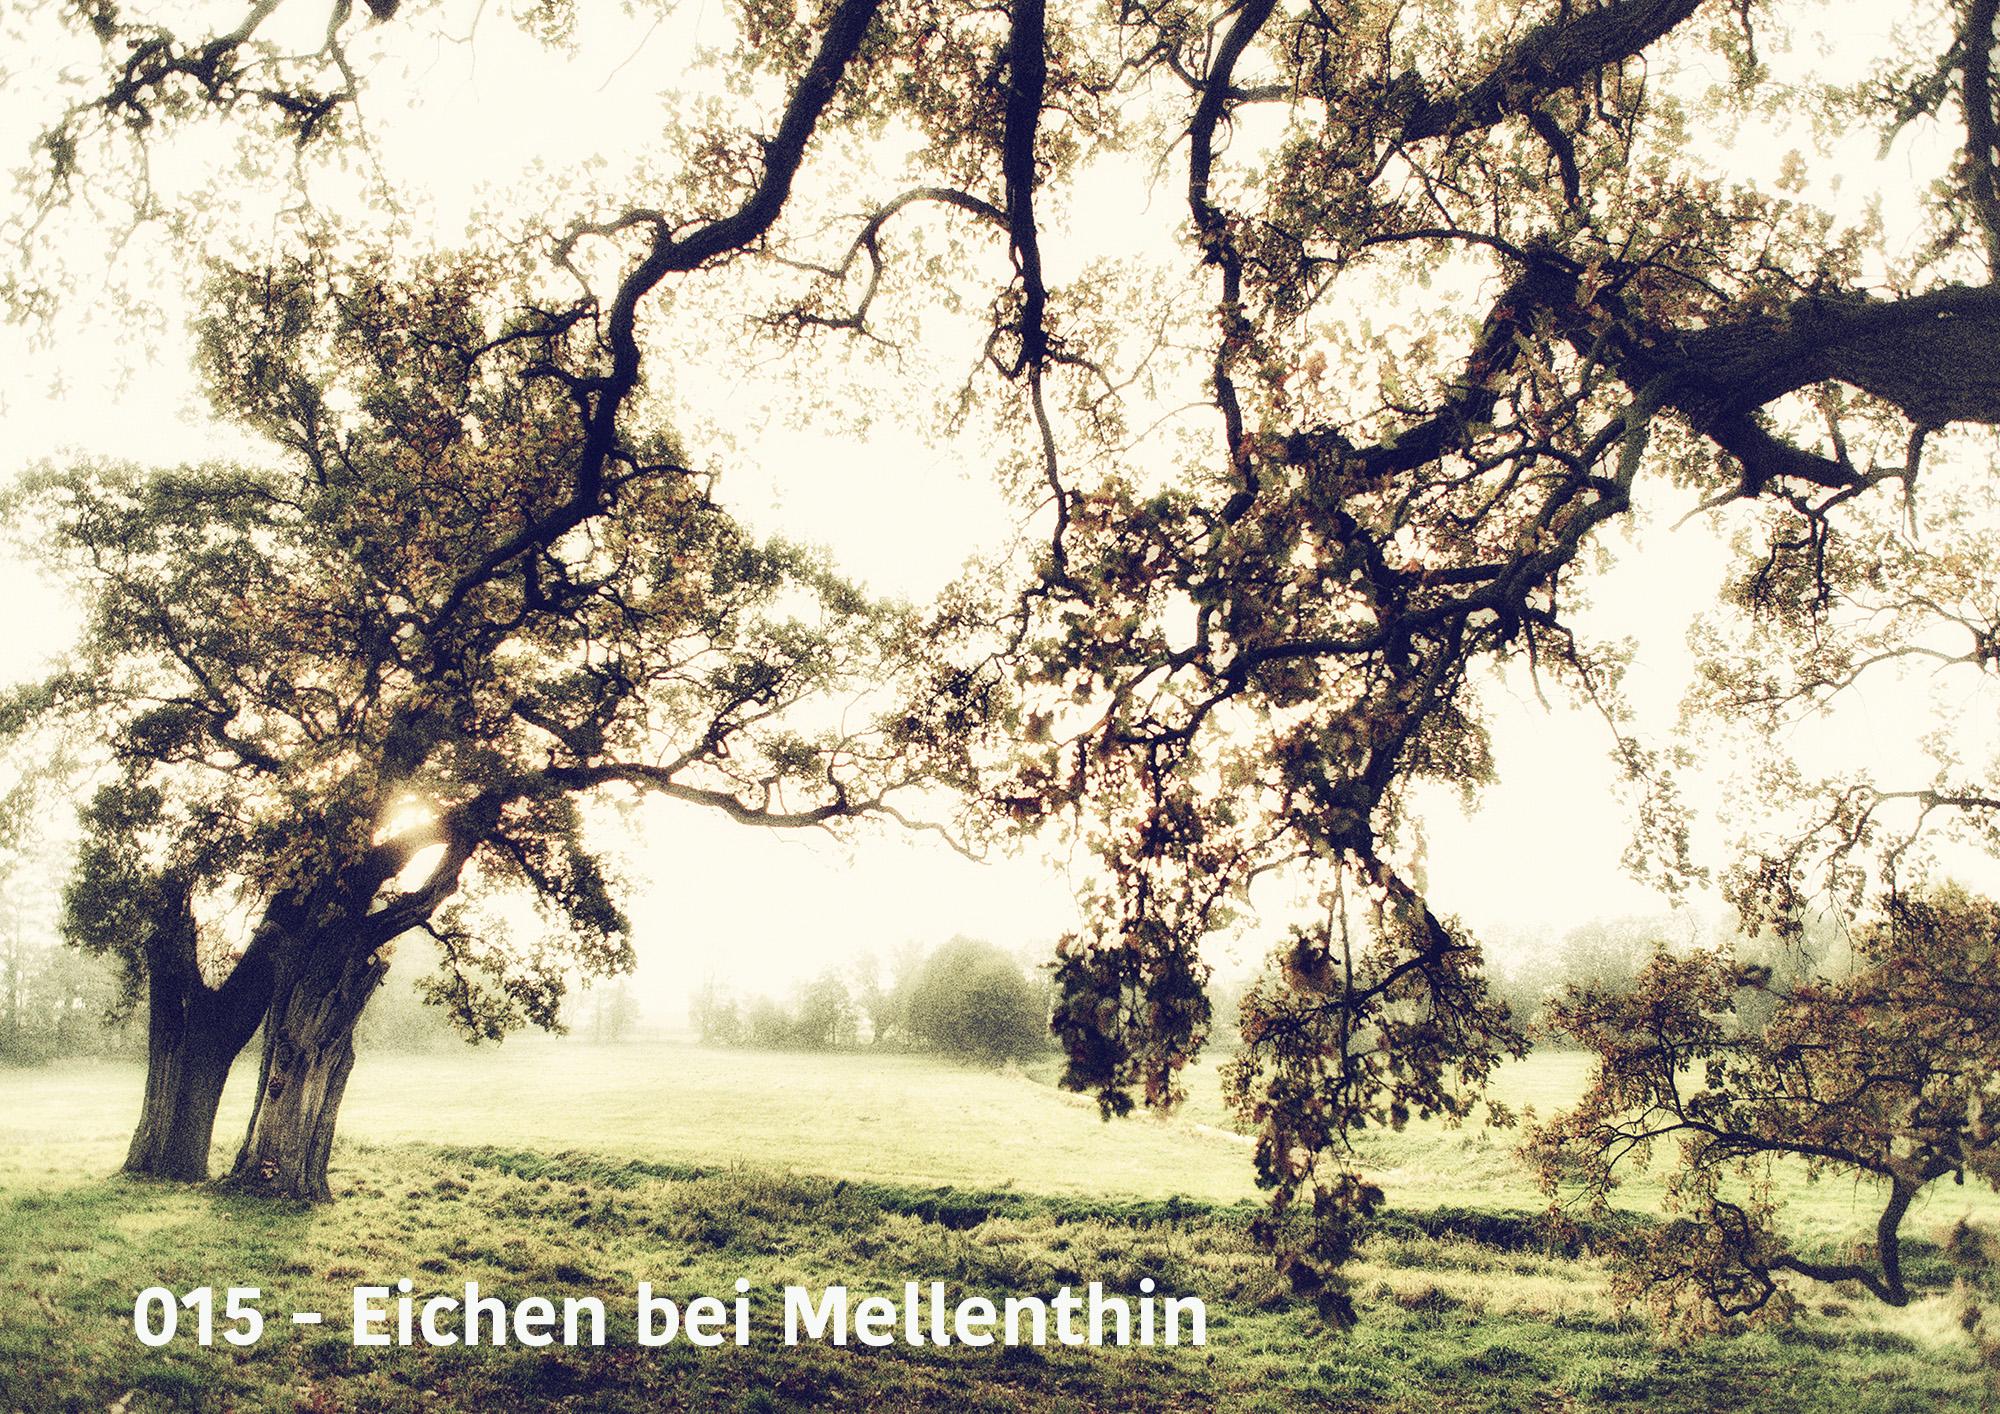 Usedom Motive (1) Canvasleinwanddruck auf Keilrahmen 60 x 80